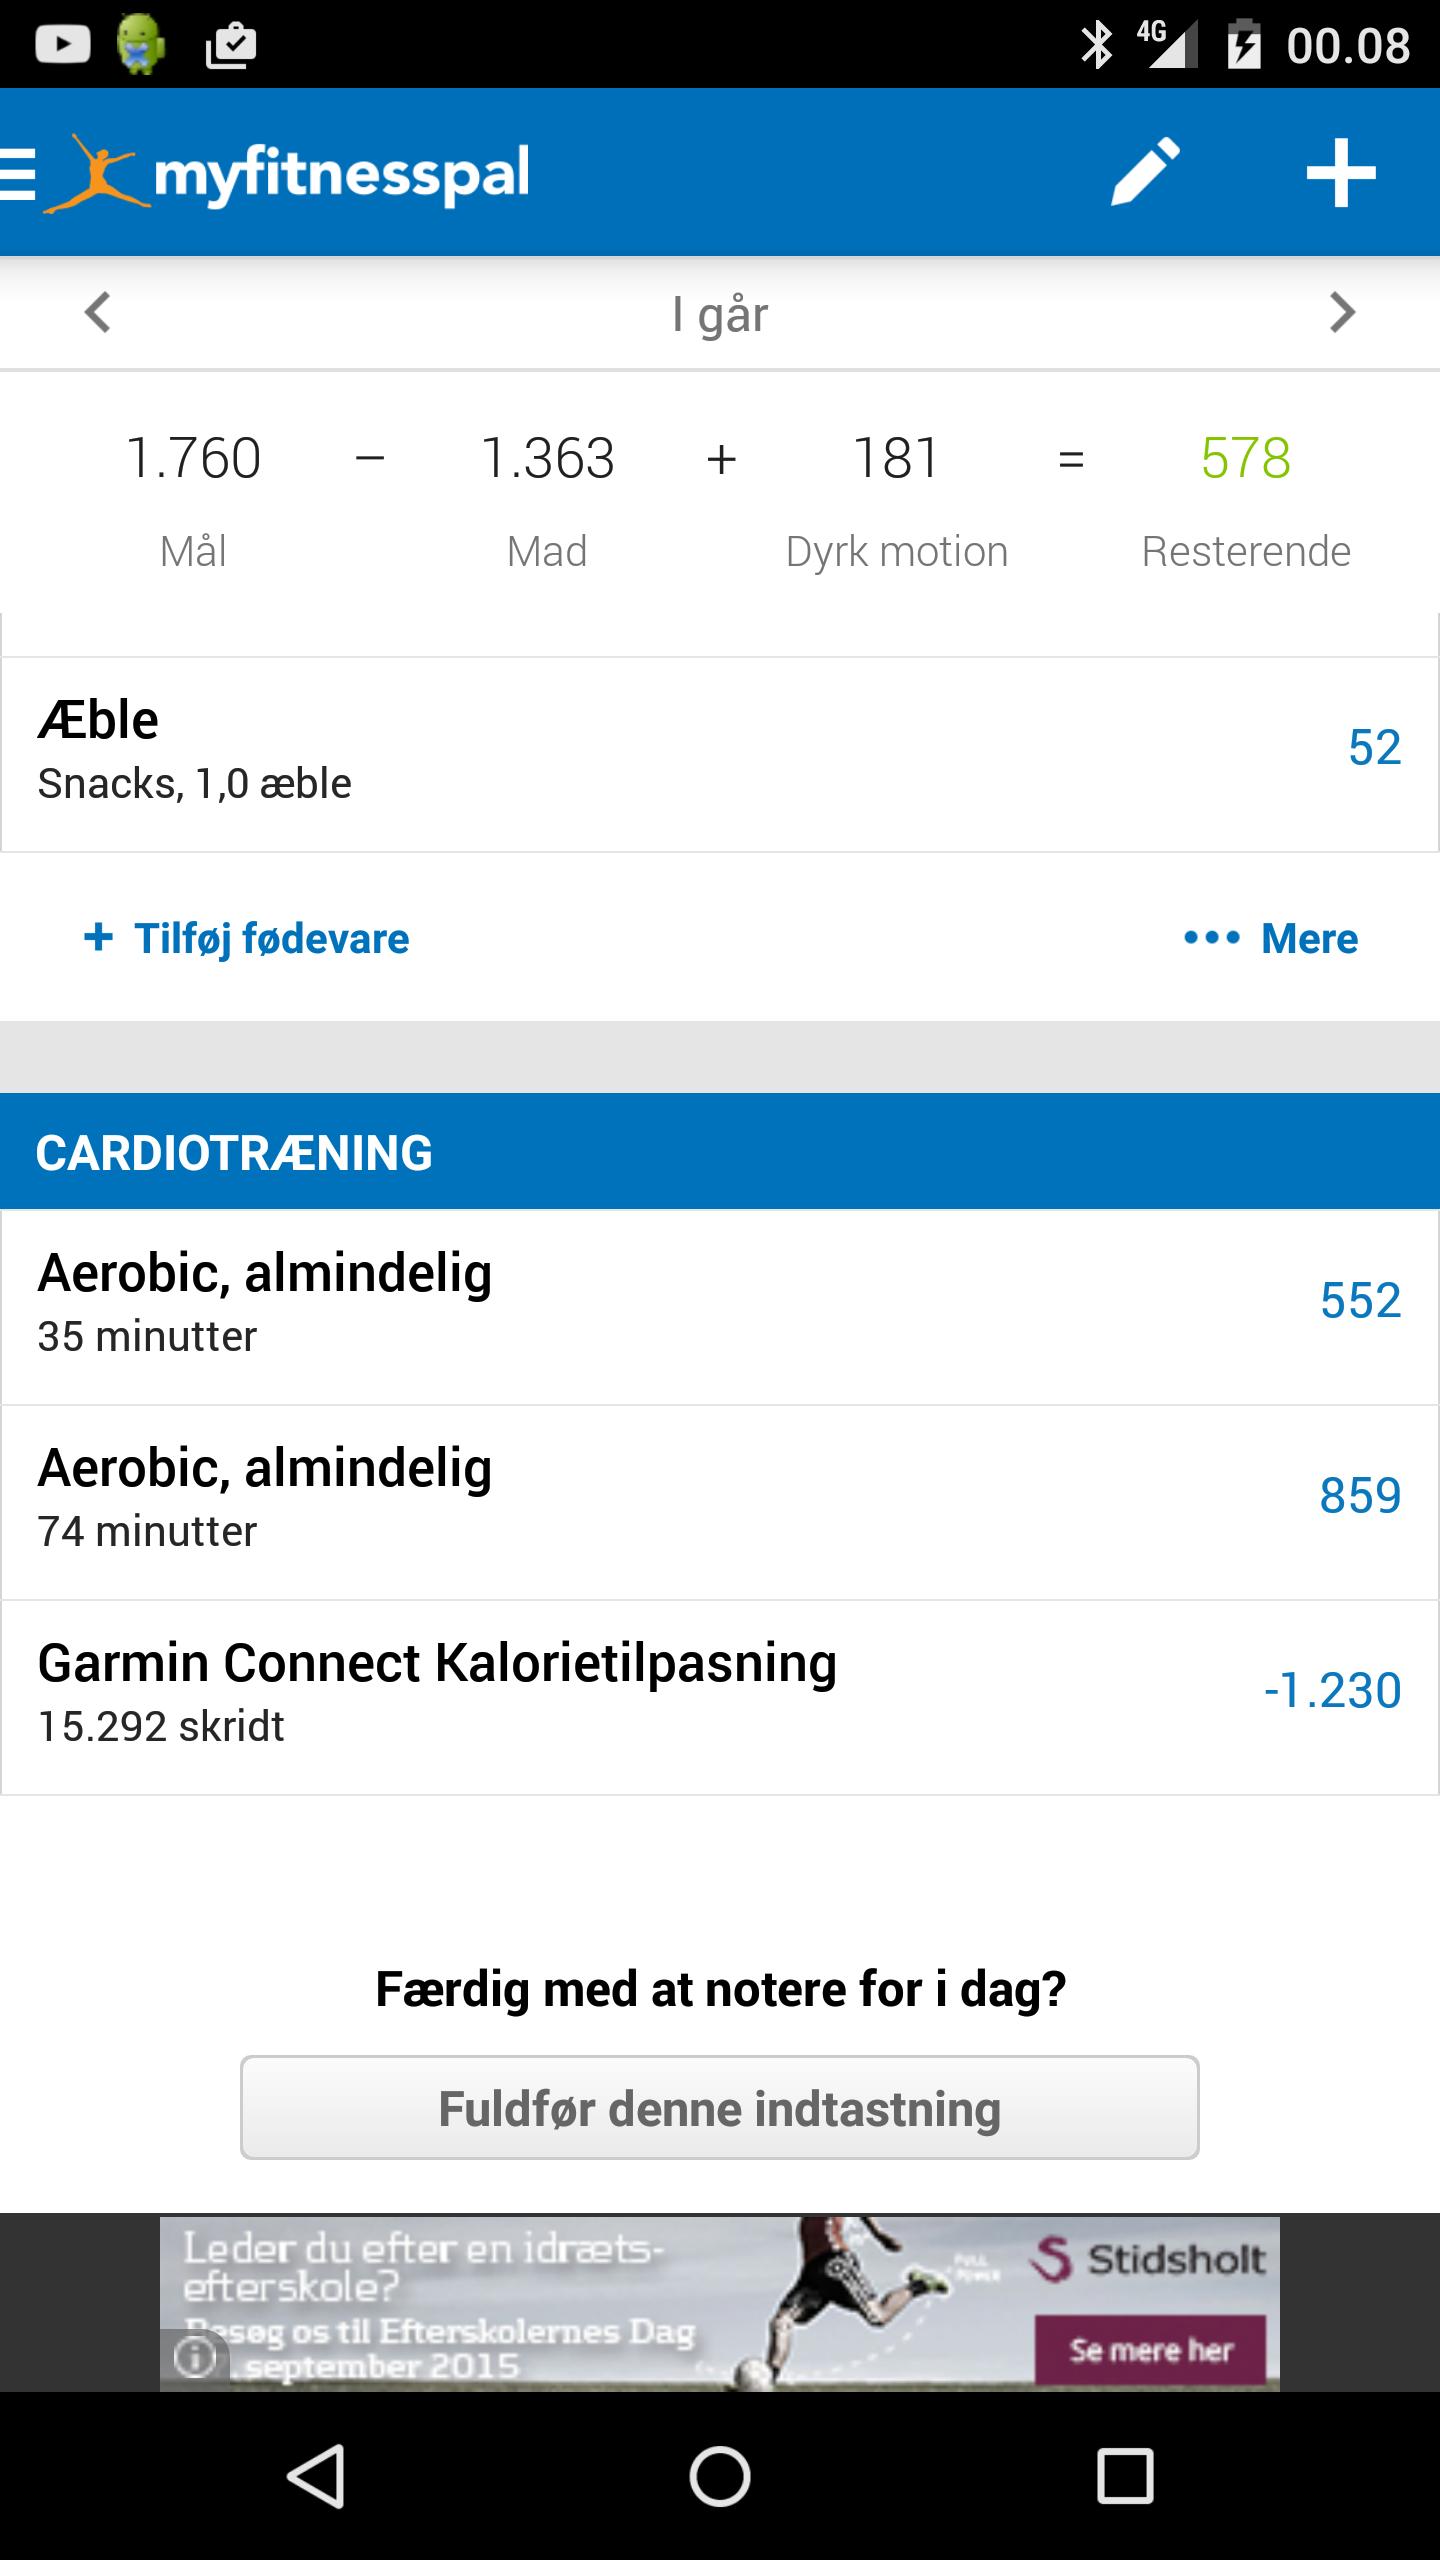 Garmin Vivoactive, Calorie adjustment, somethings gotta be